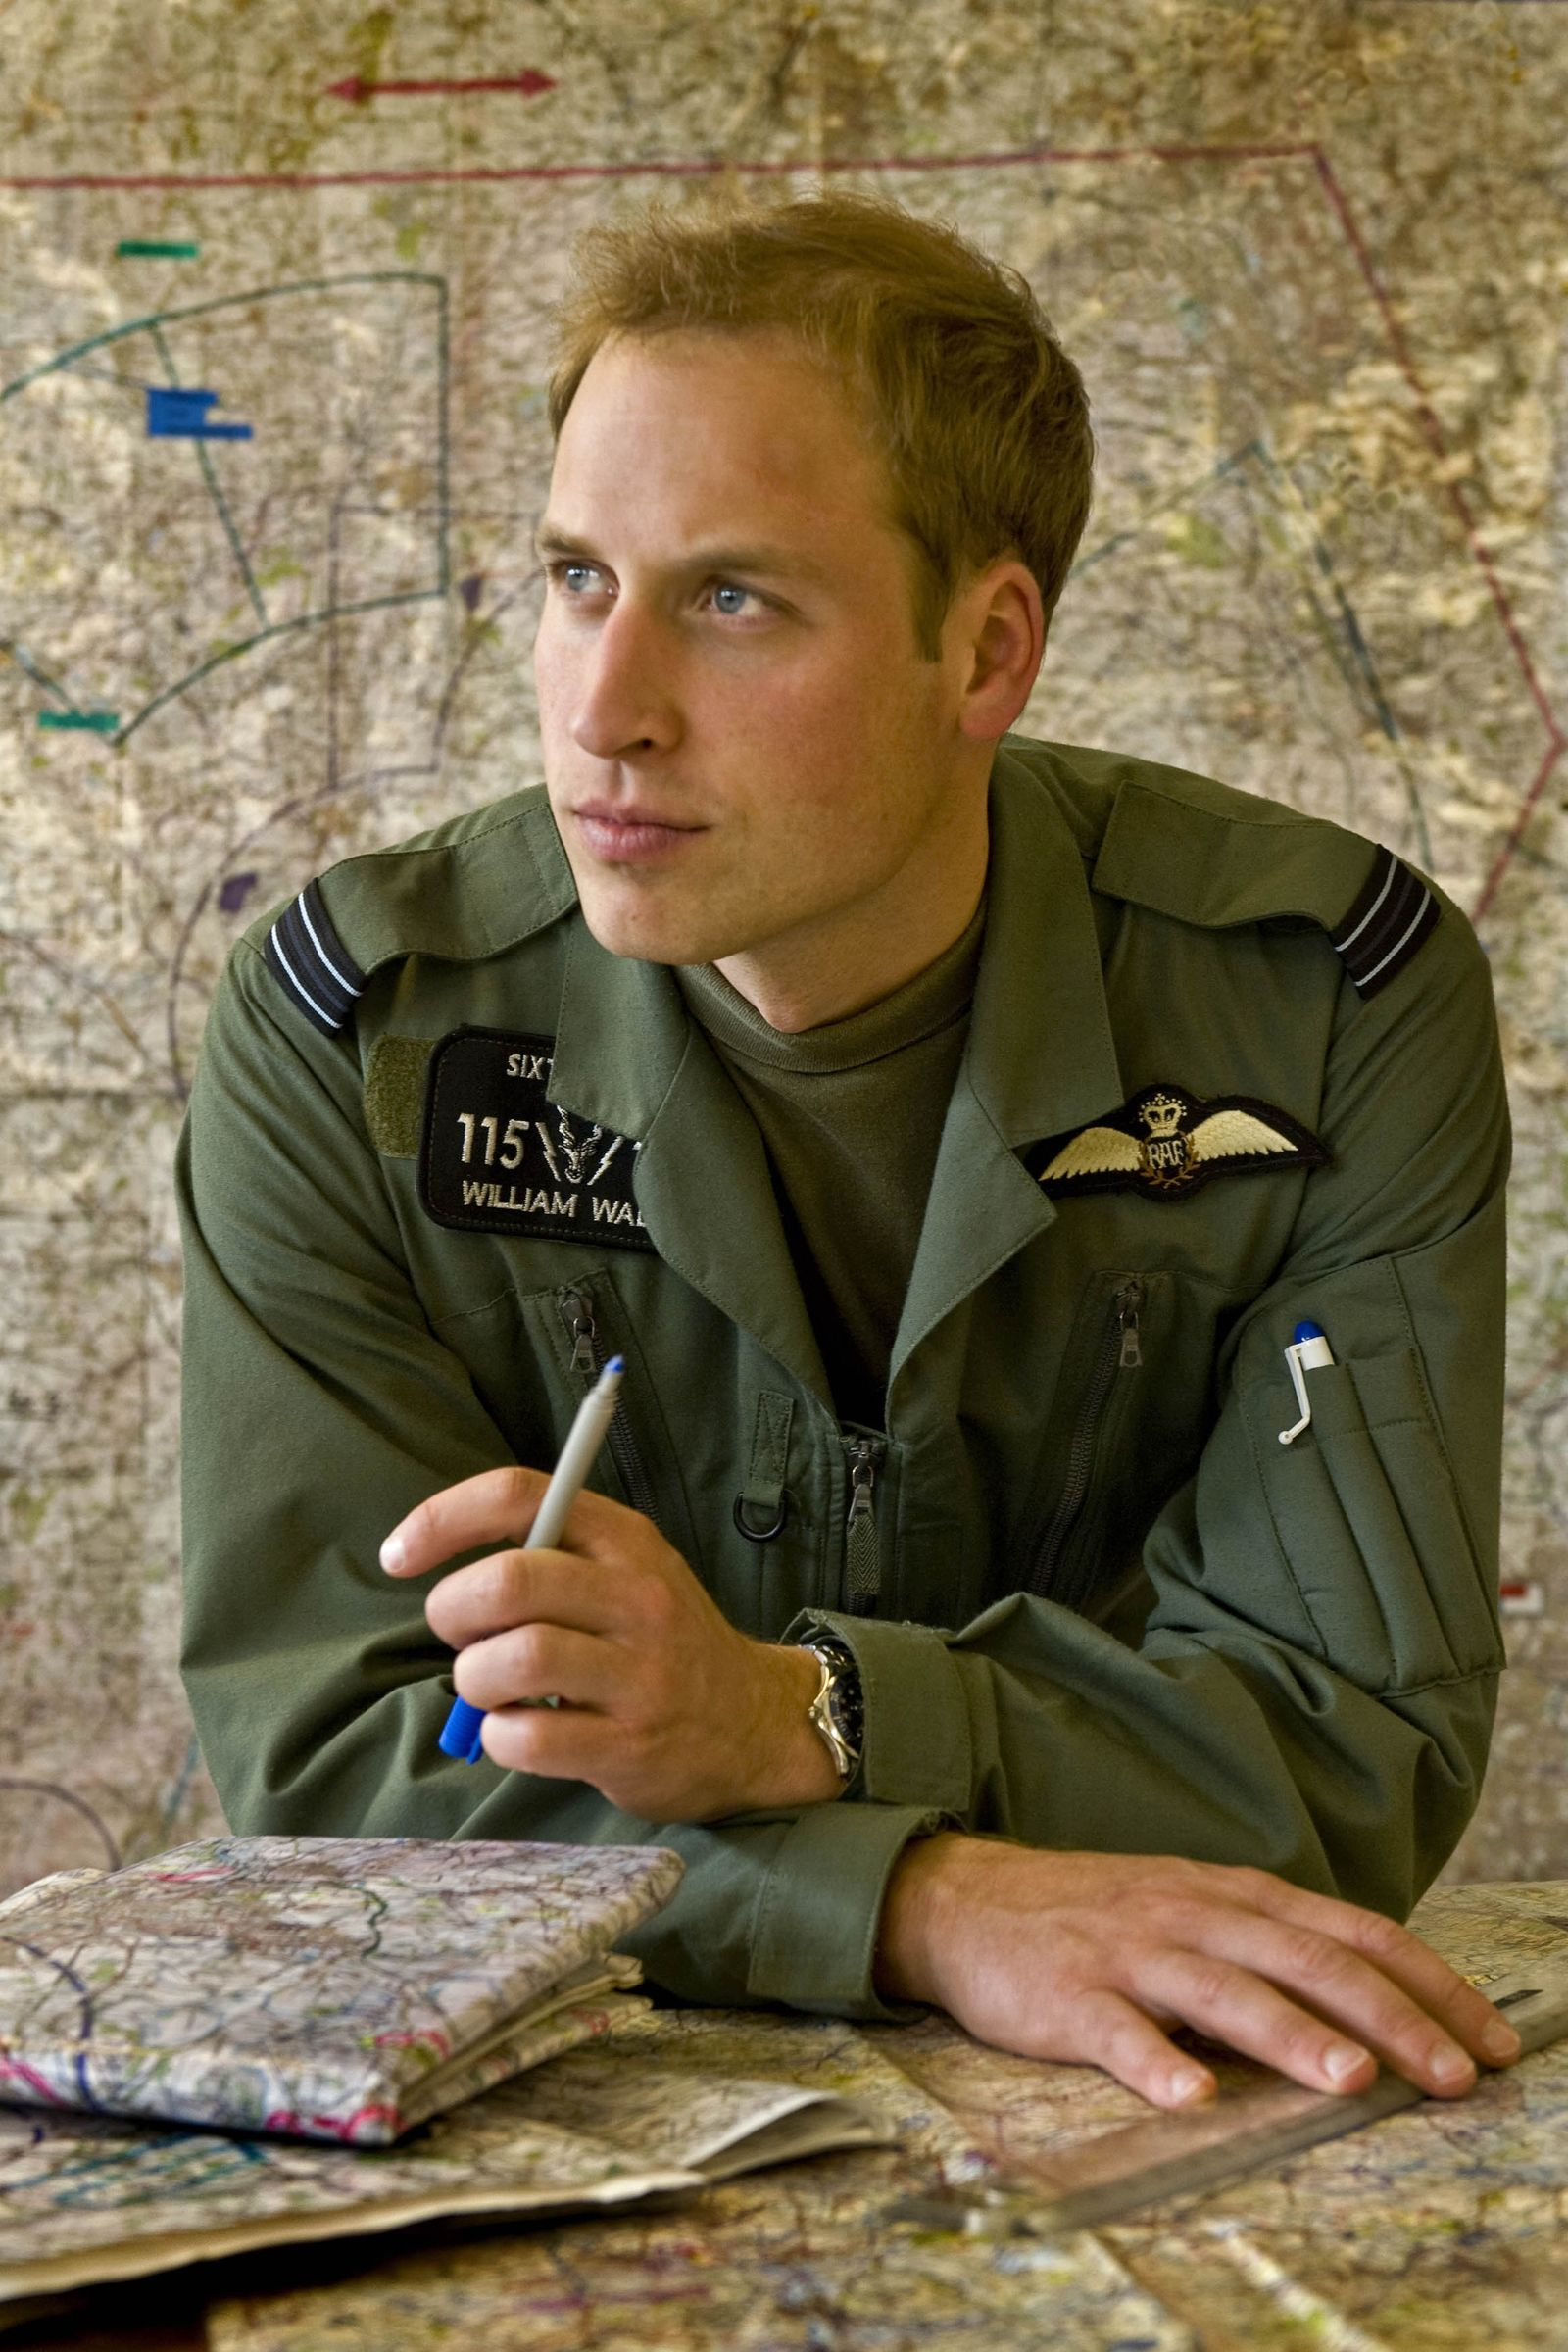 Prinz William / Air Force